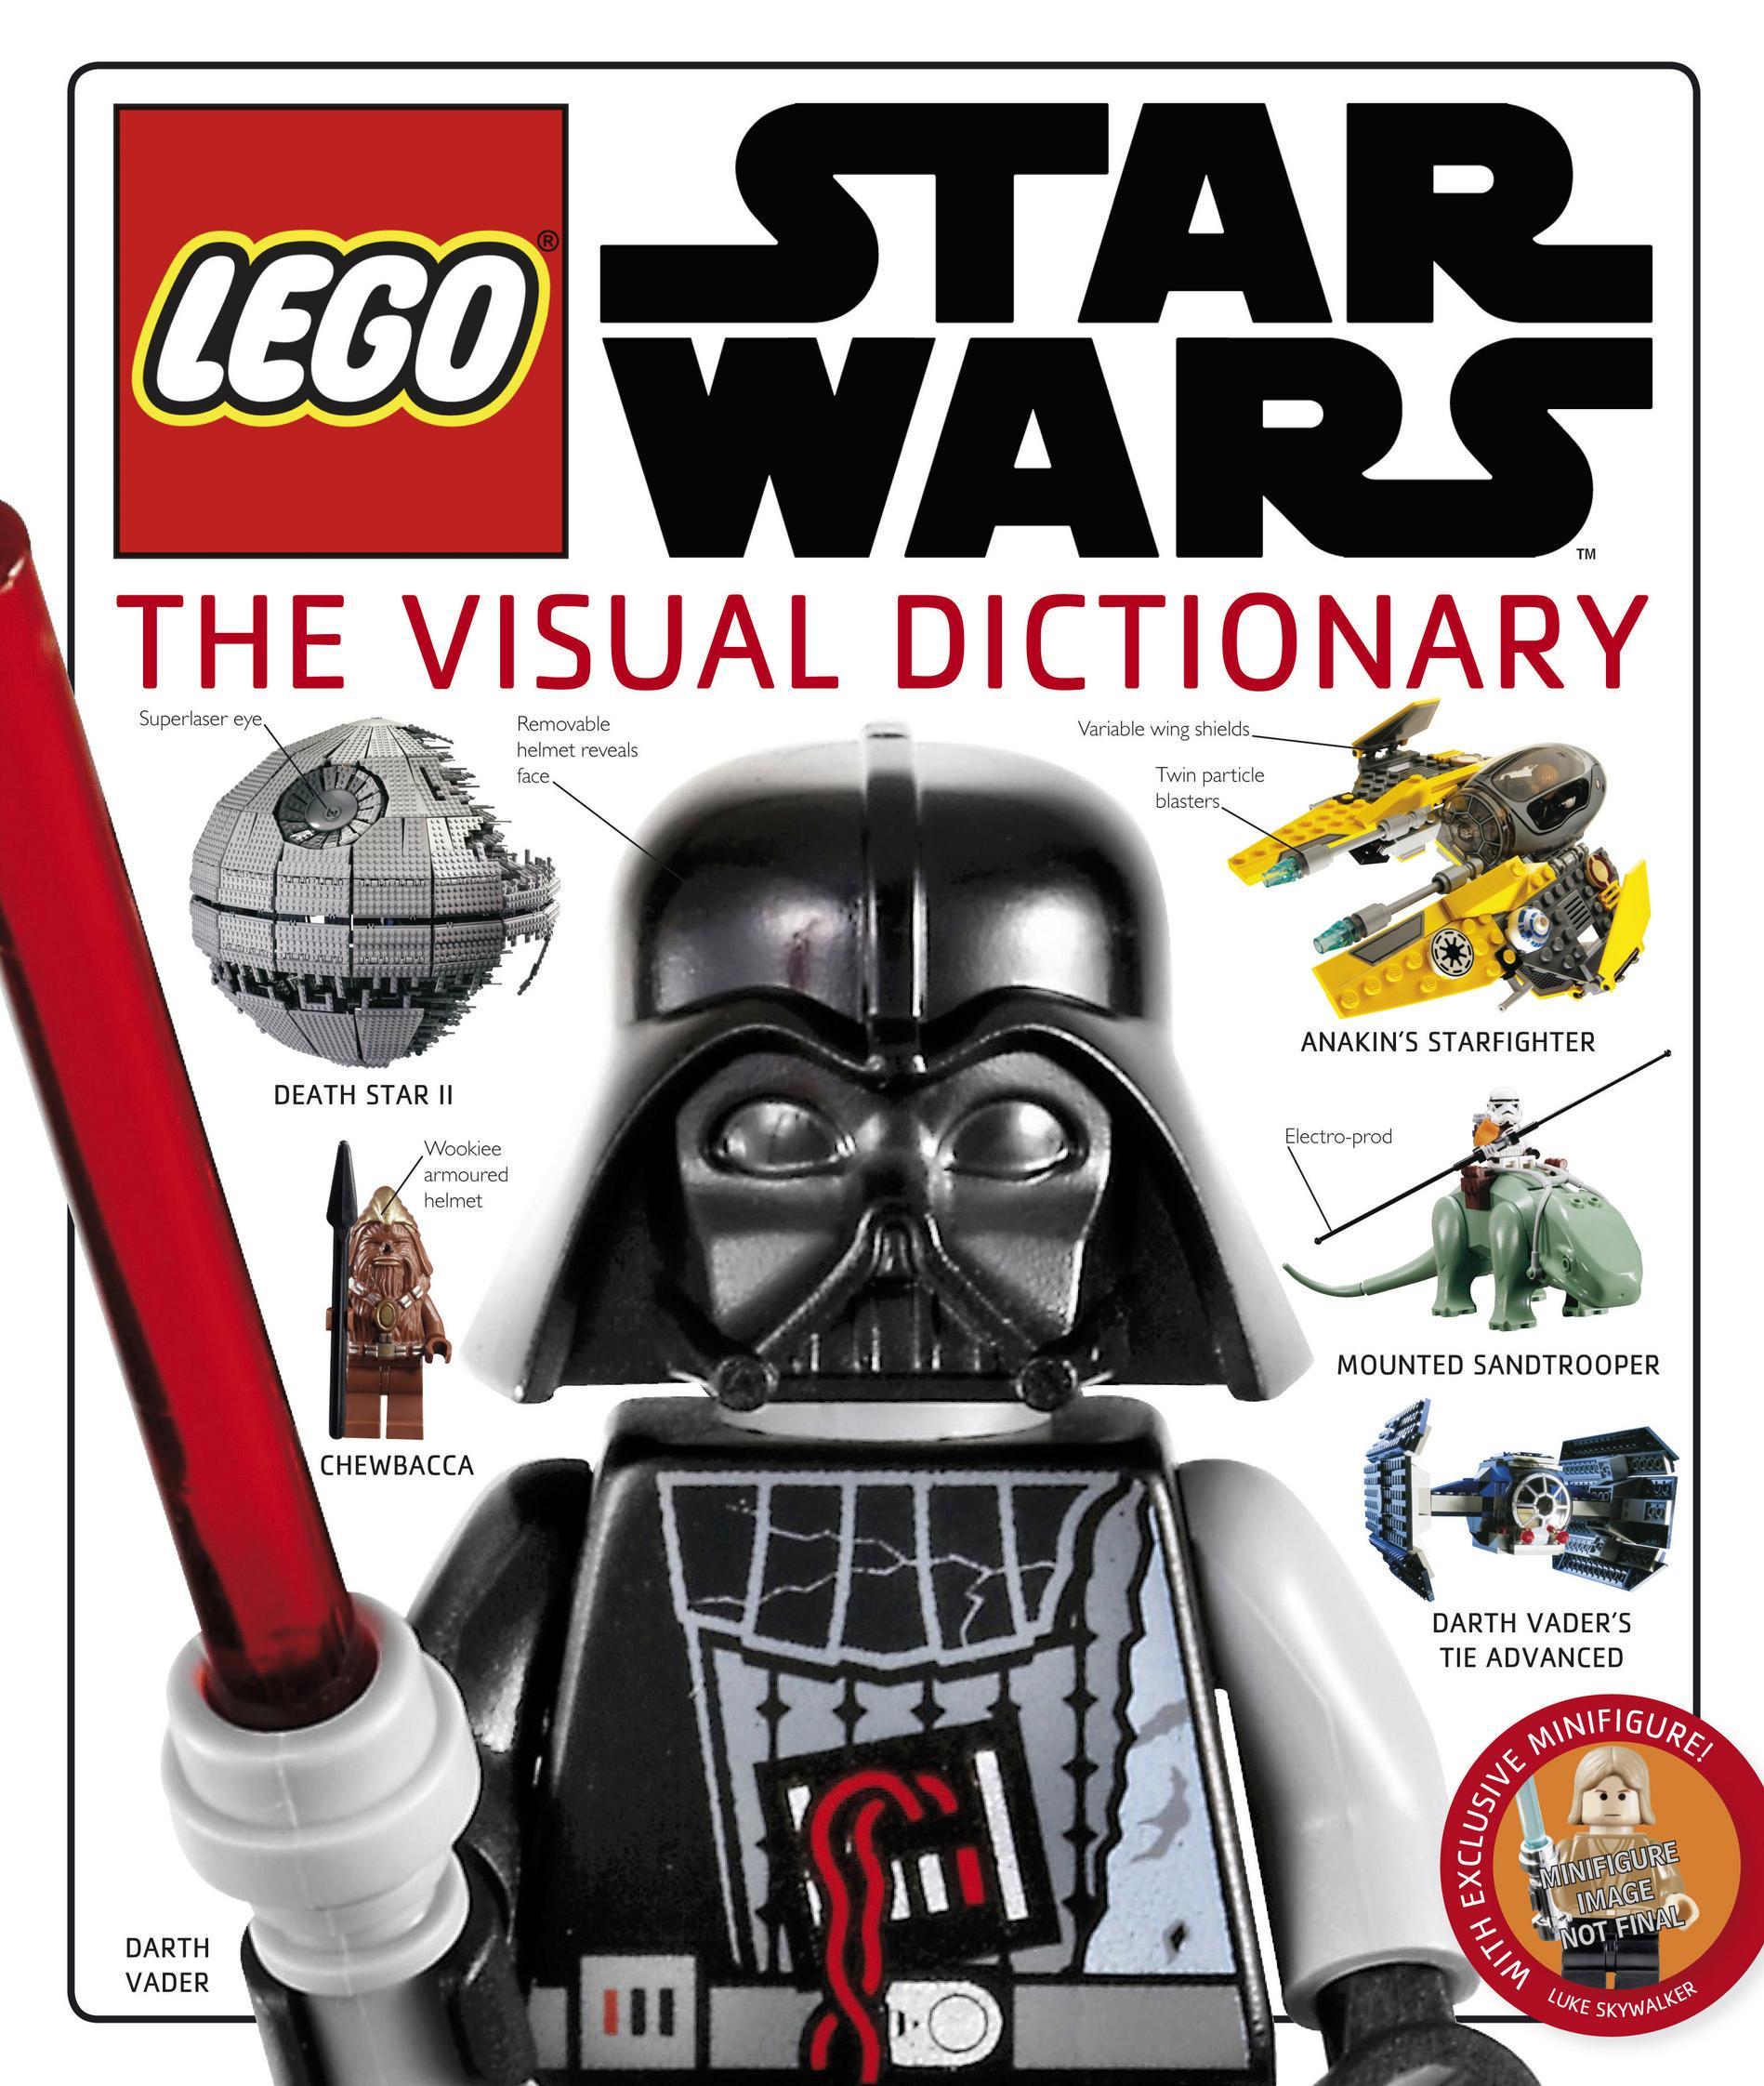 lego star wars dictionary 2014